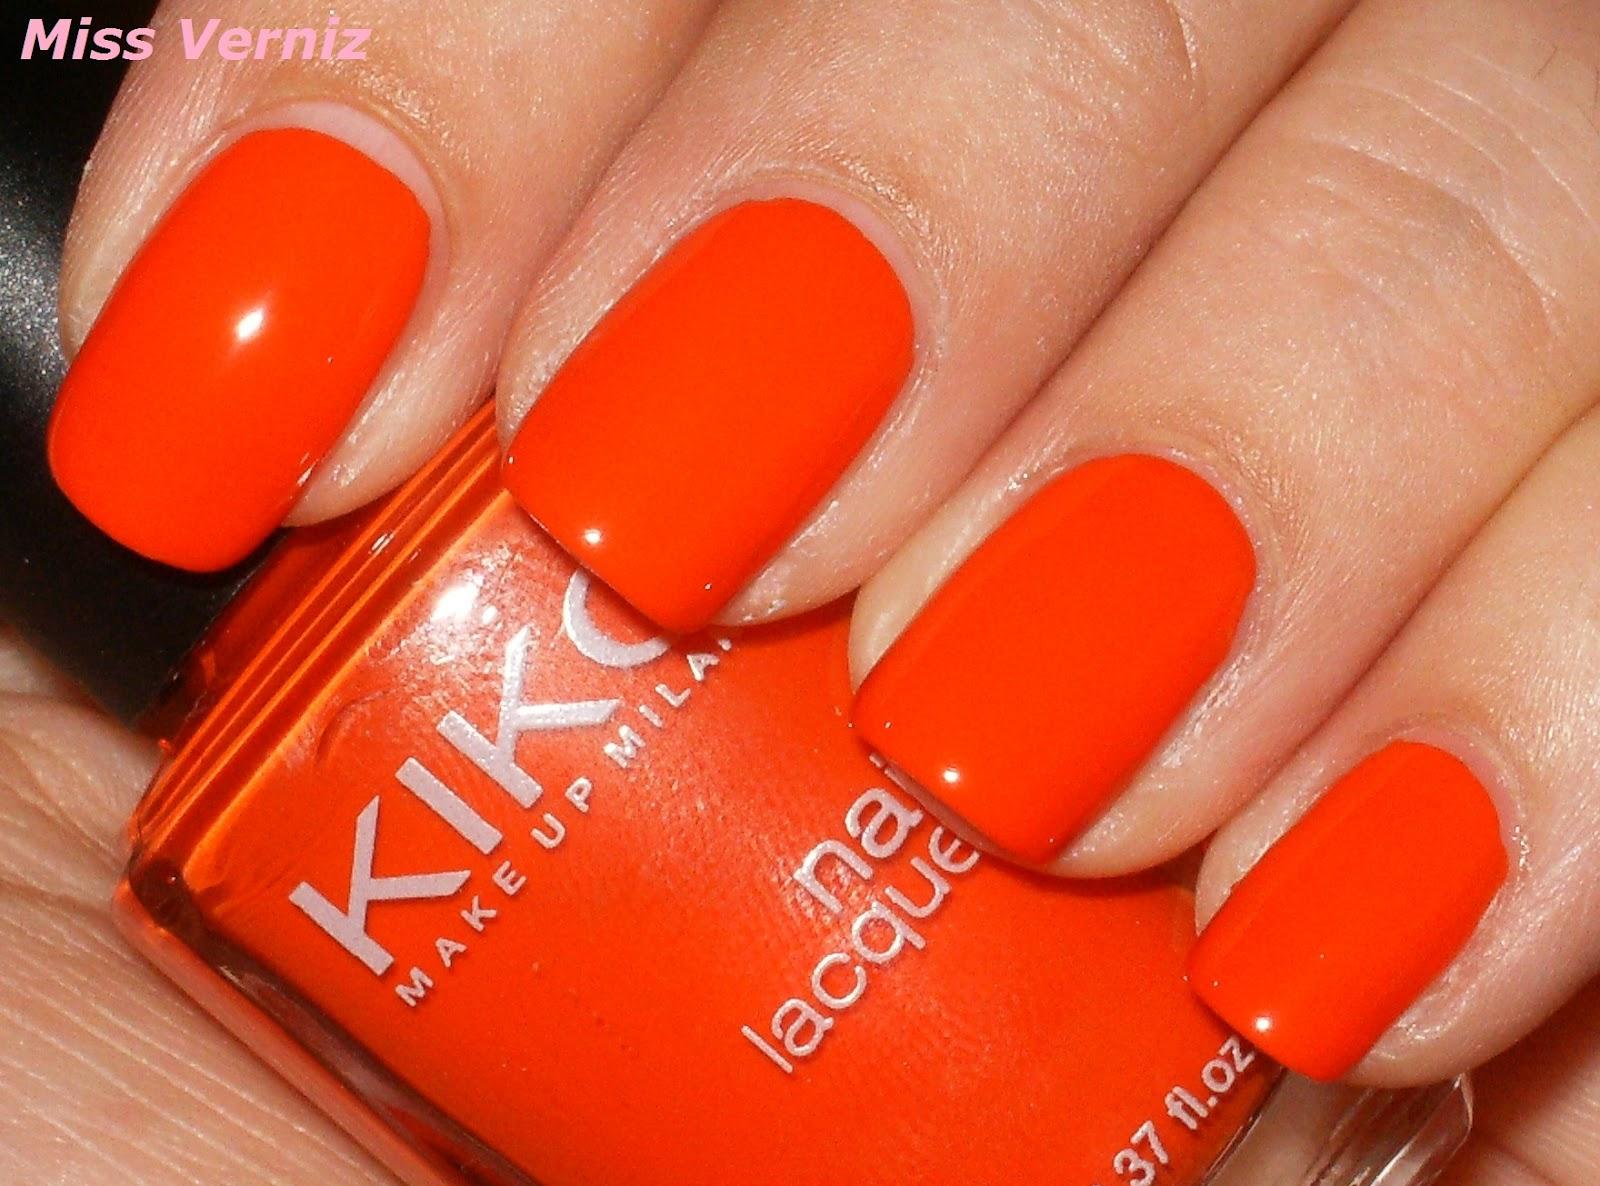 miss verniz kiko numero 357 bright orange. Black Bedroom Furniture Sets. Home Design Ideas